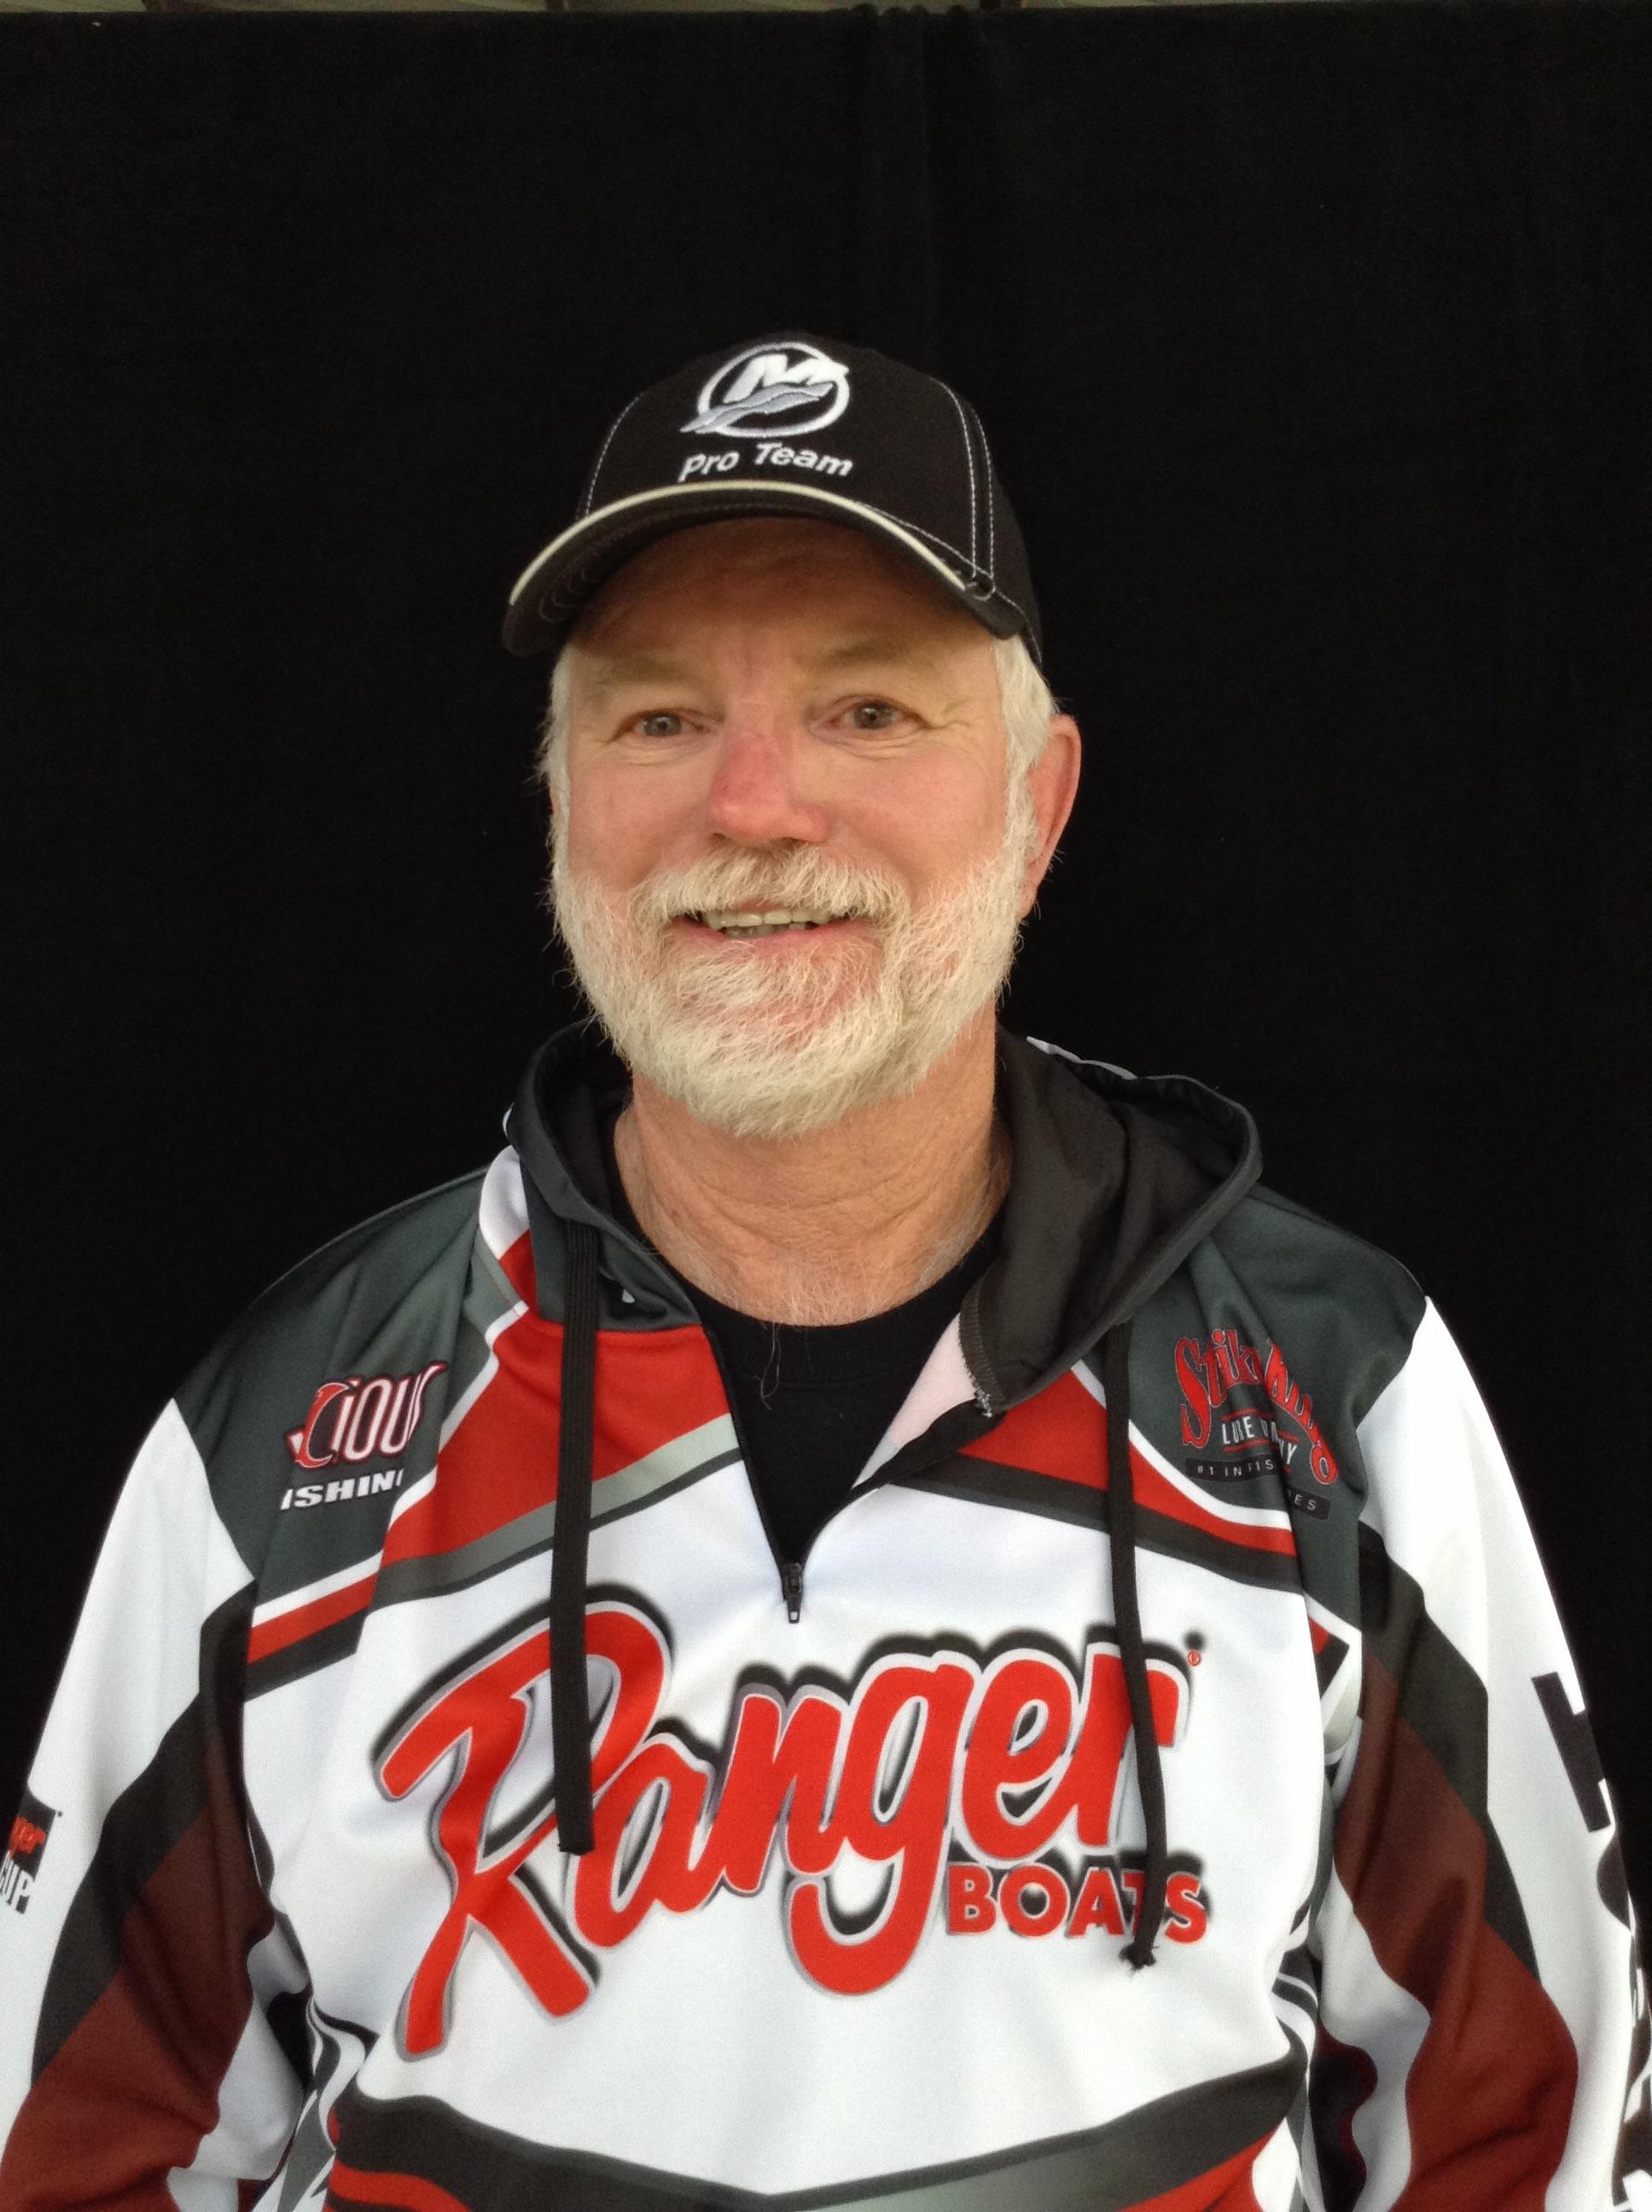 MLF Roger Stegall Profile